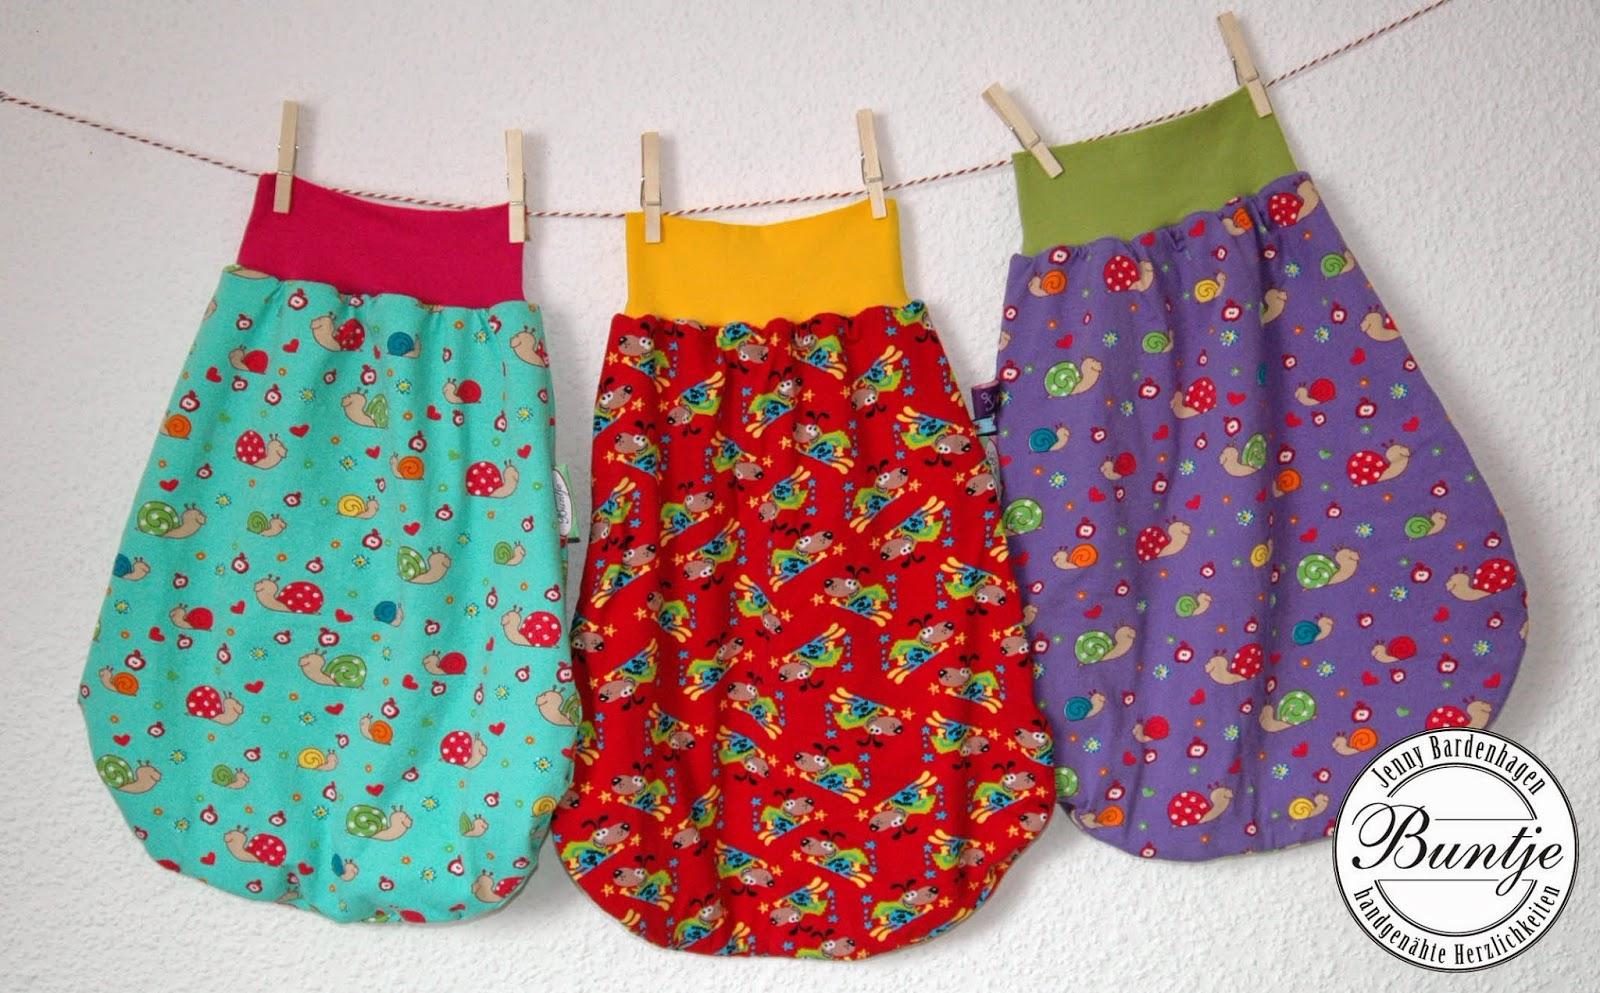 Pucksack Kuschelsack Strampelsack Baby Geschenk Geburt Taufe Baumwolle gefüttert Farbenmix Jersey handmade nähen Buntje individuell rot mint lila Mädchen Junge Tiere Superheld